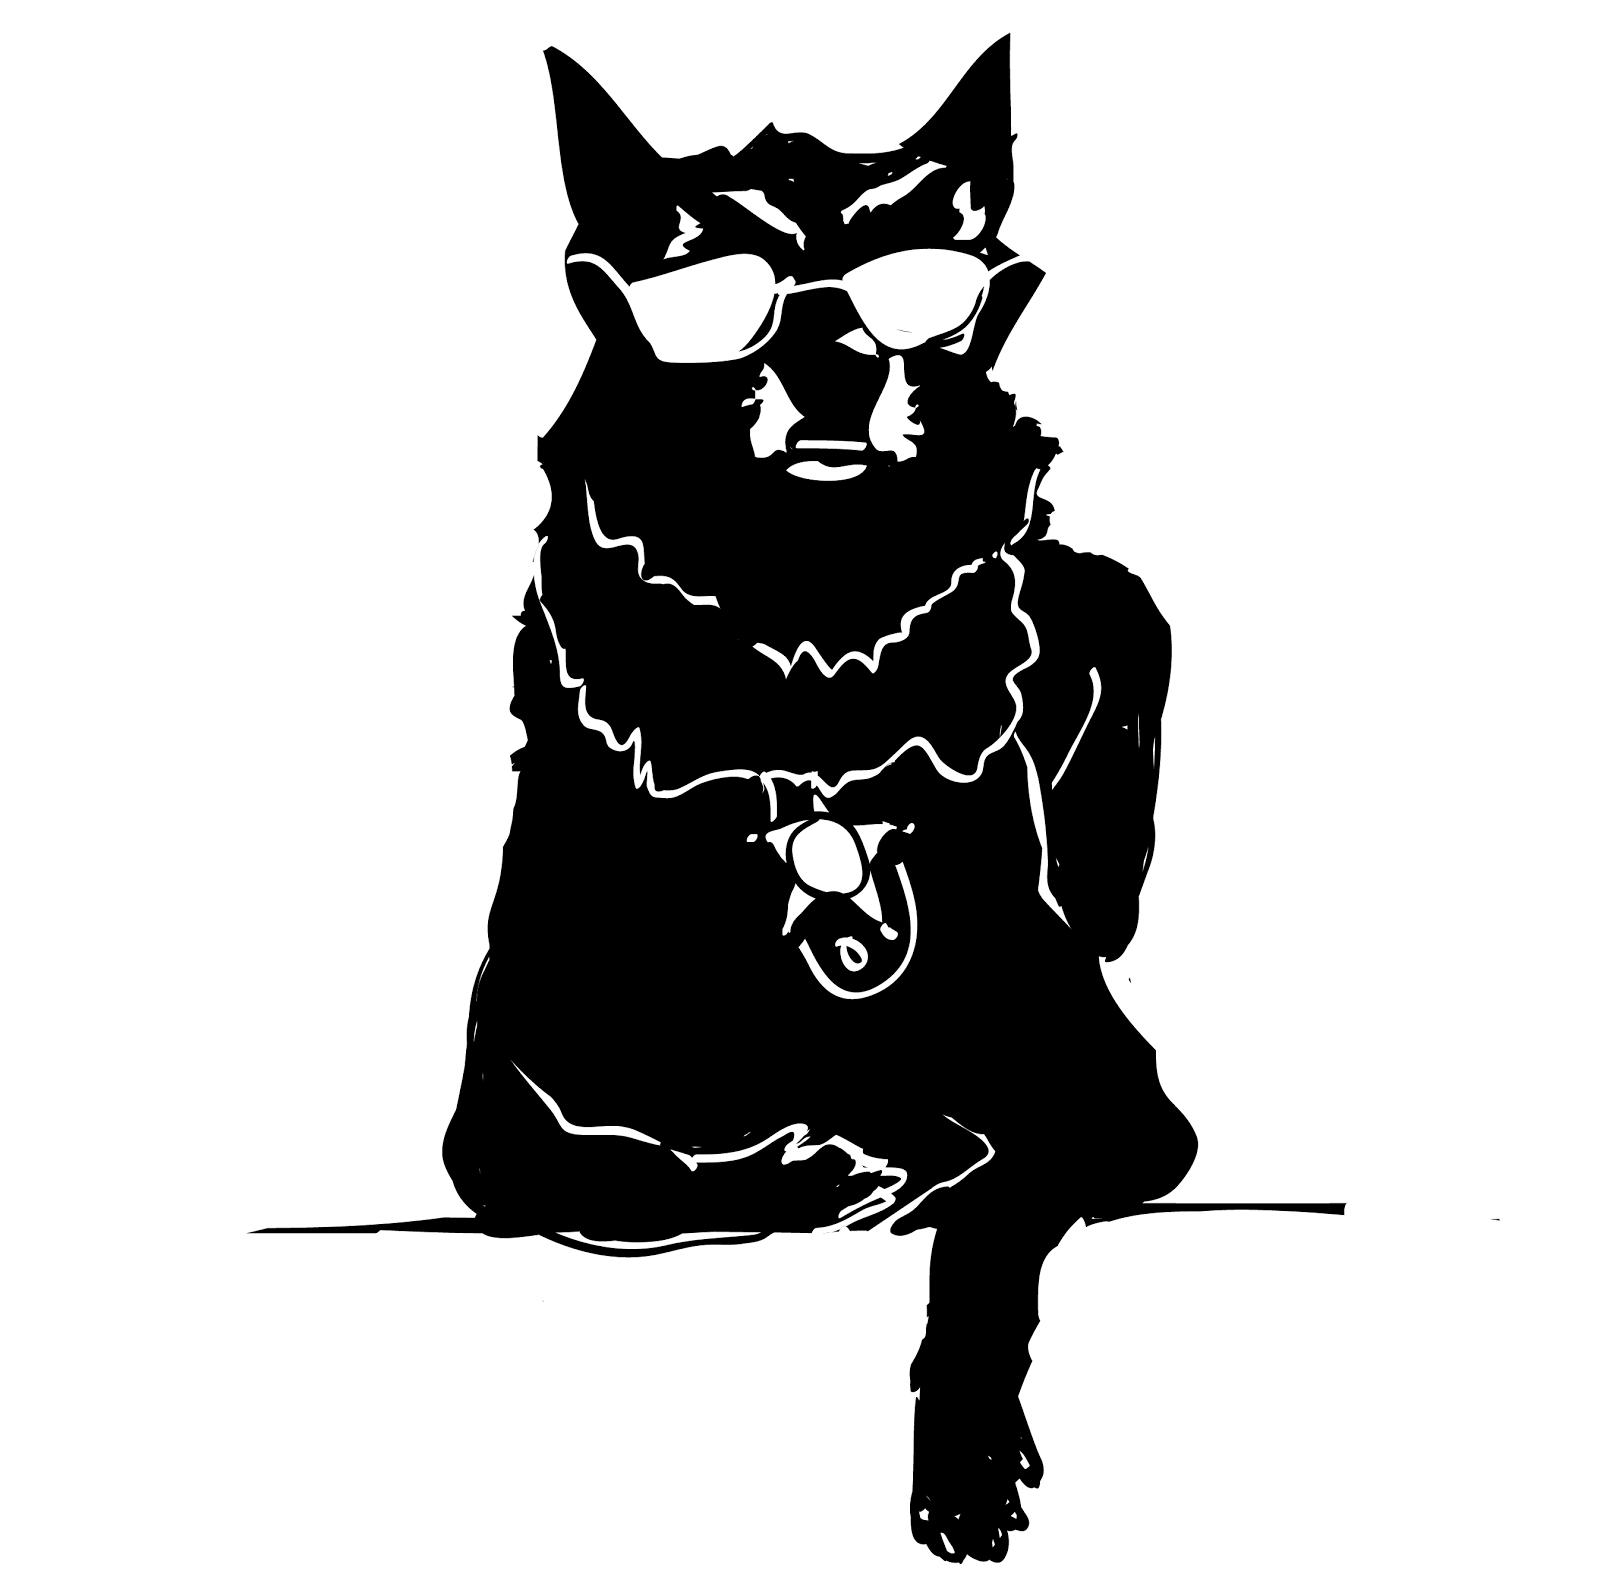 Crim_Dog_2-06